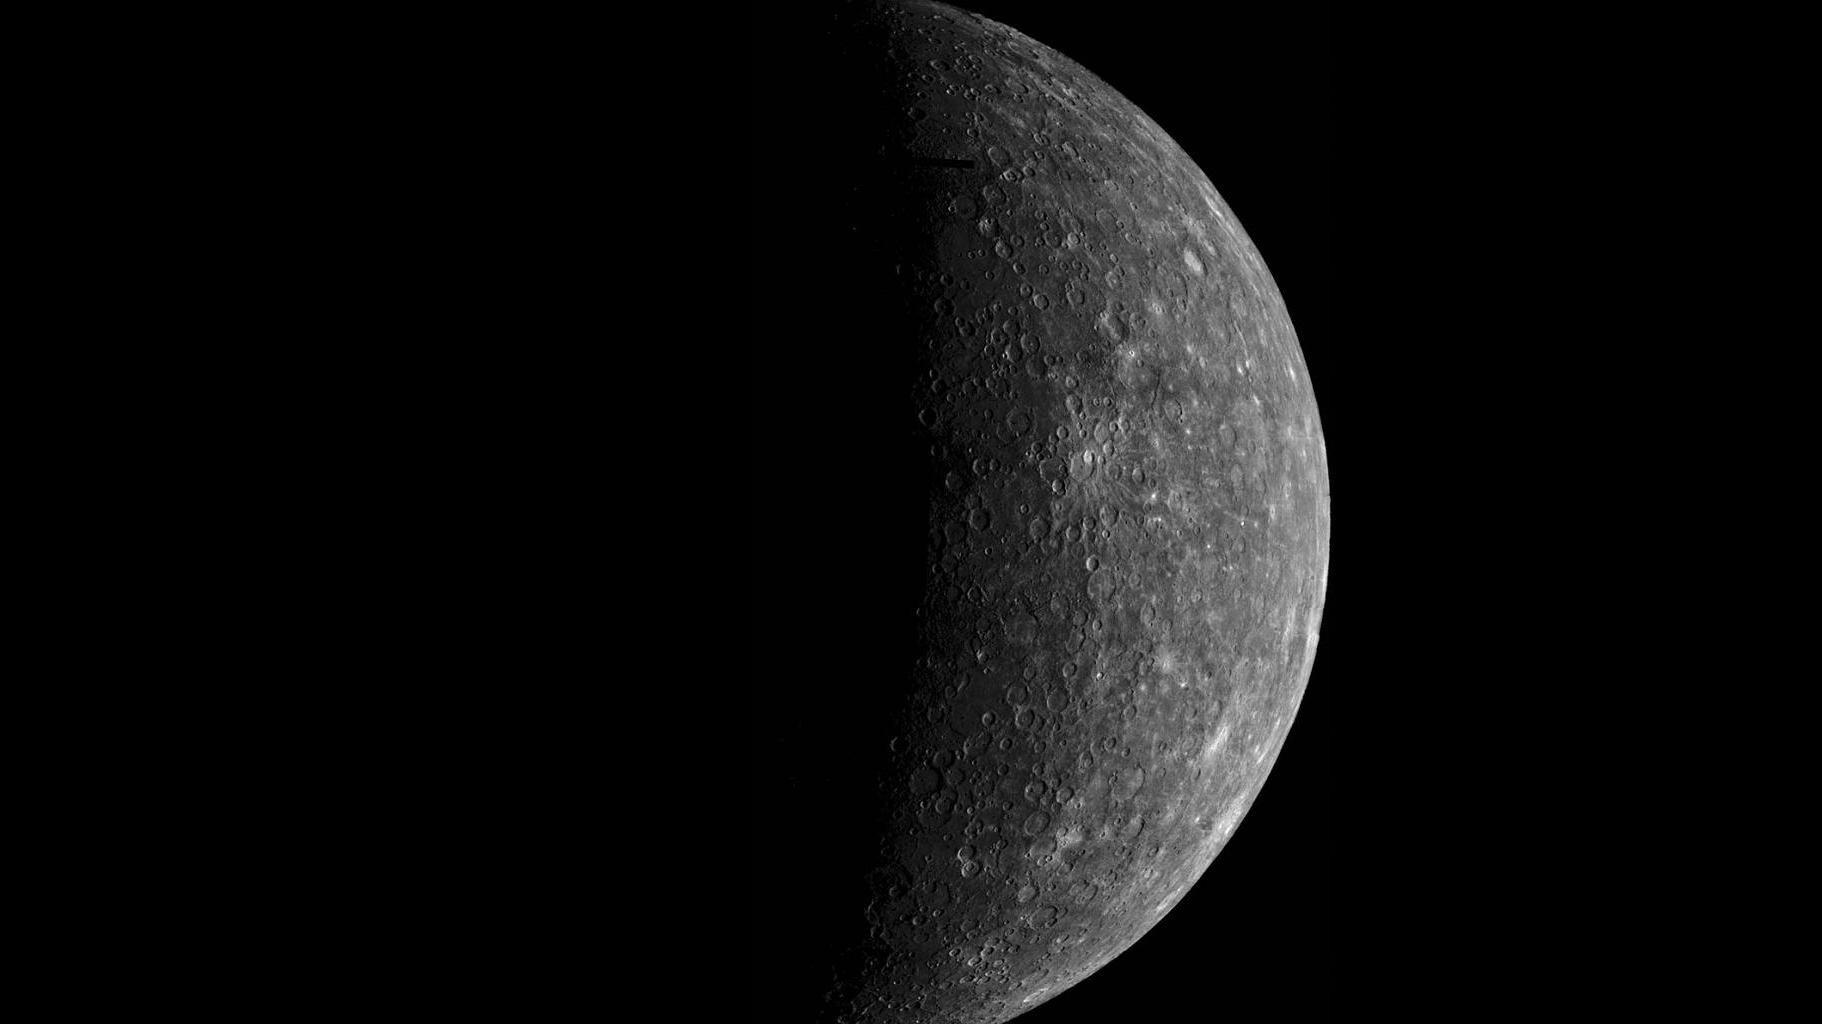 302 Moon HD Wallpapers